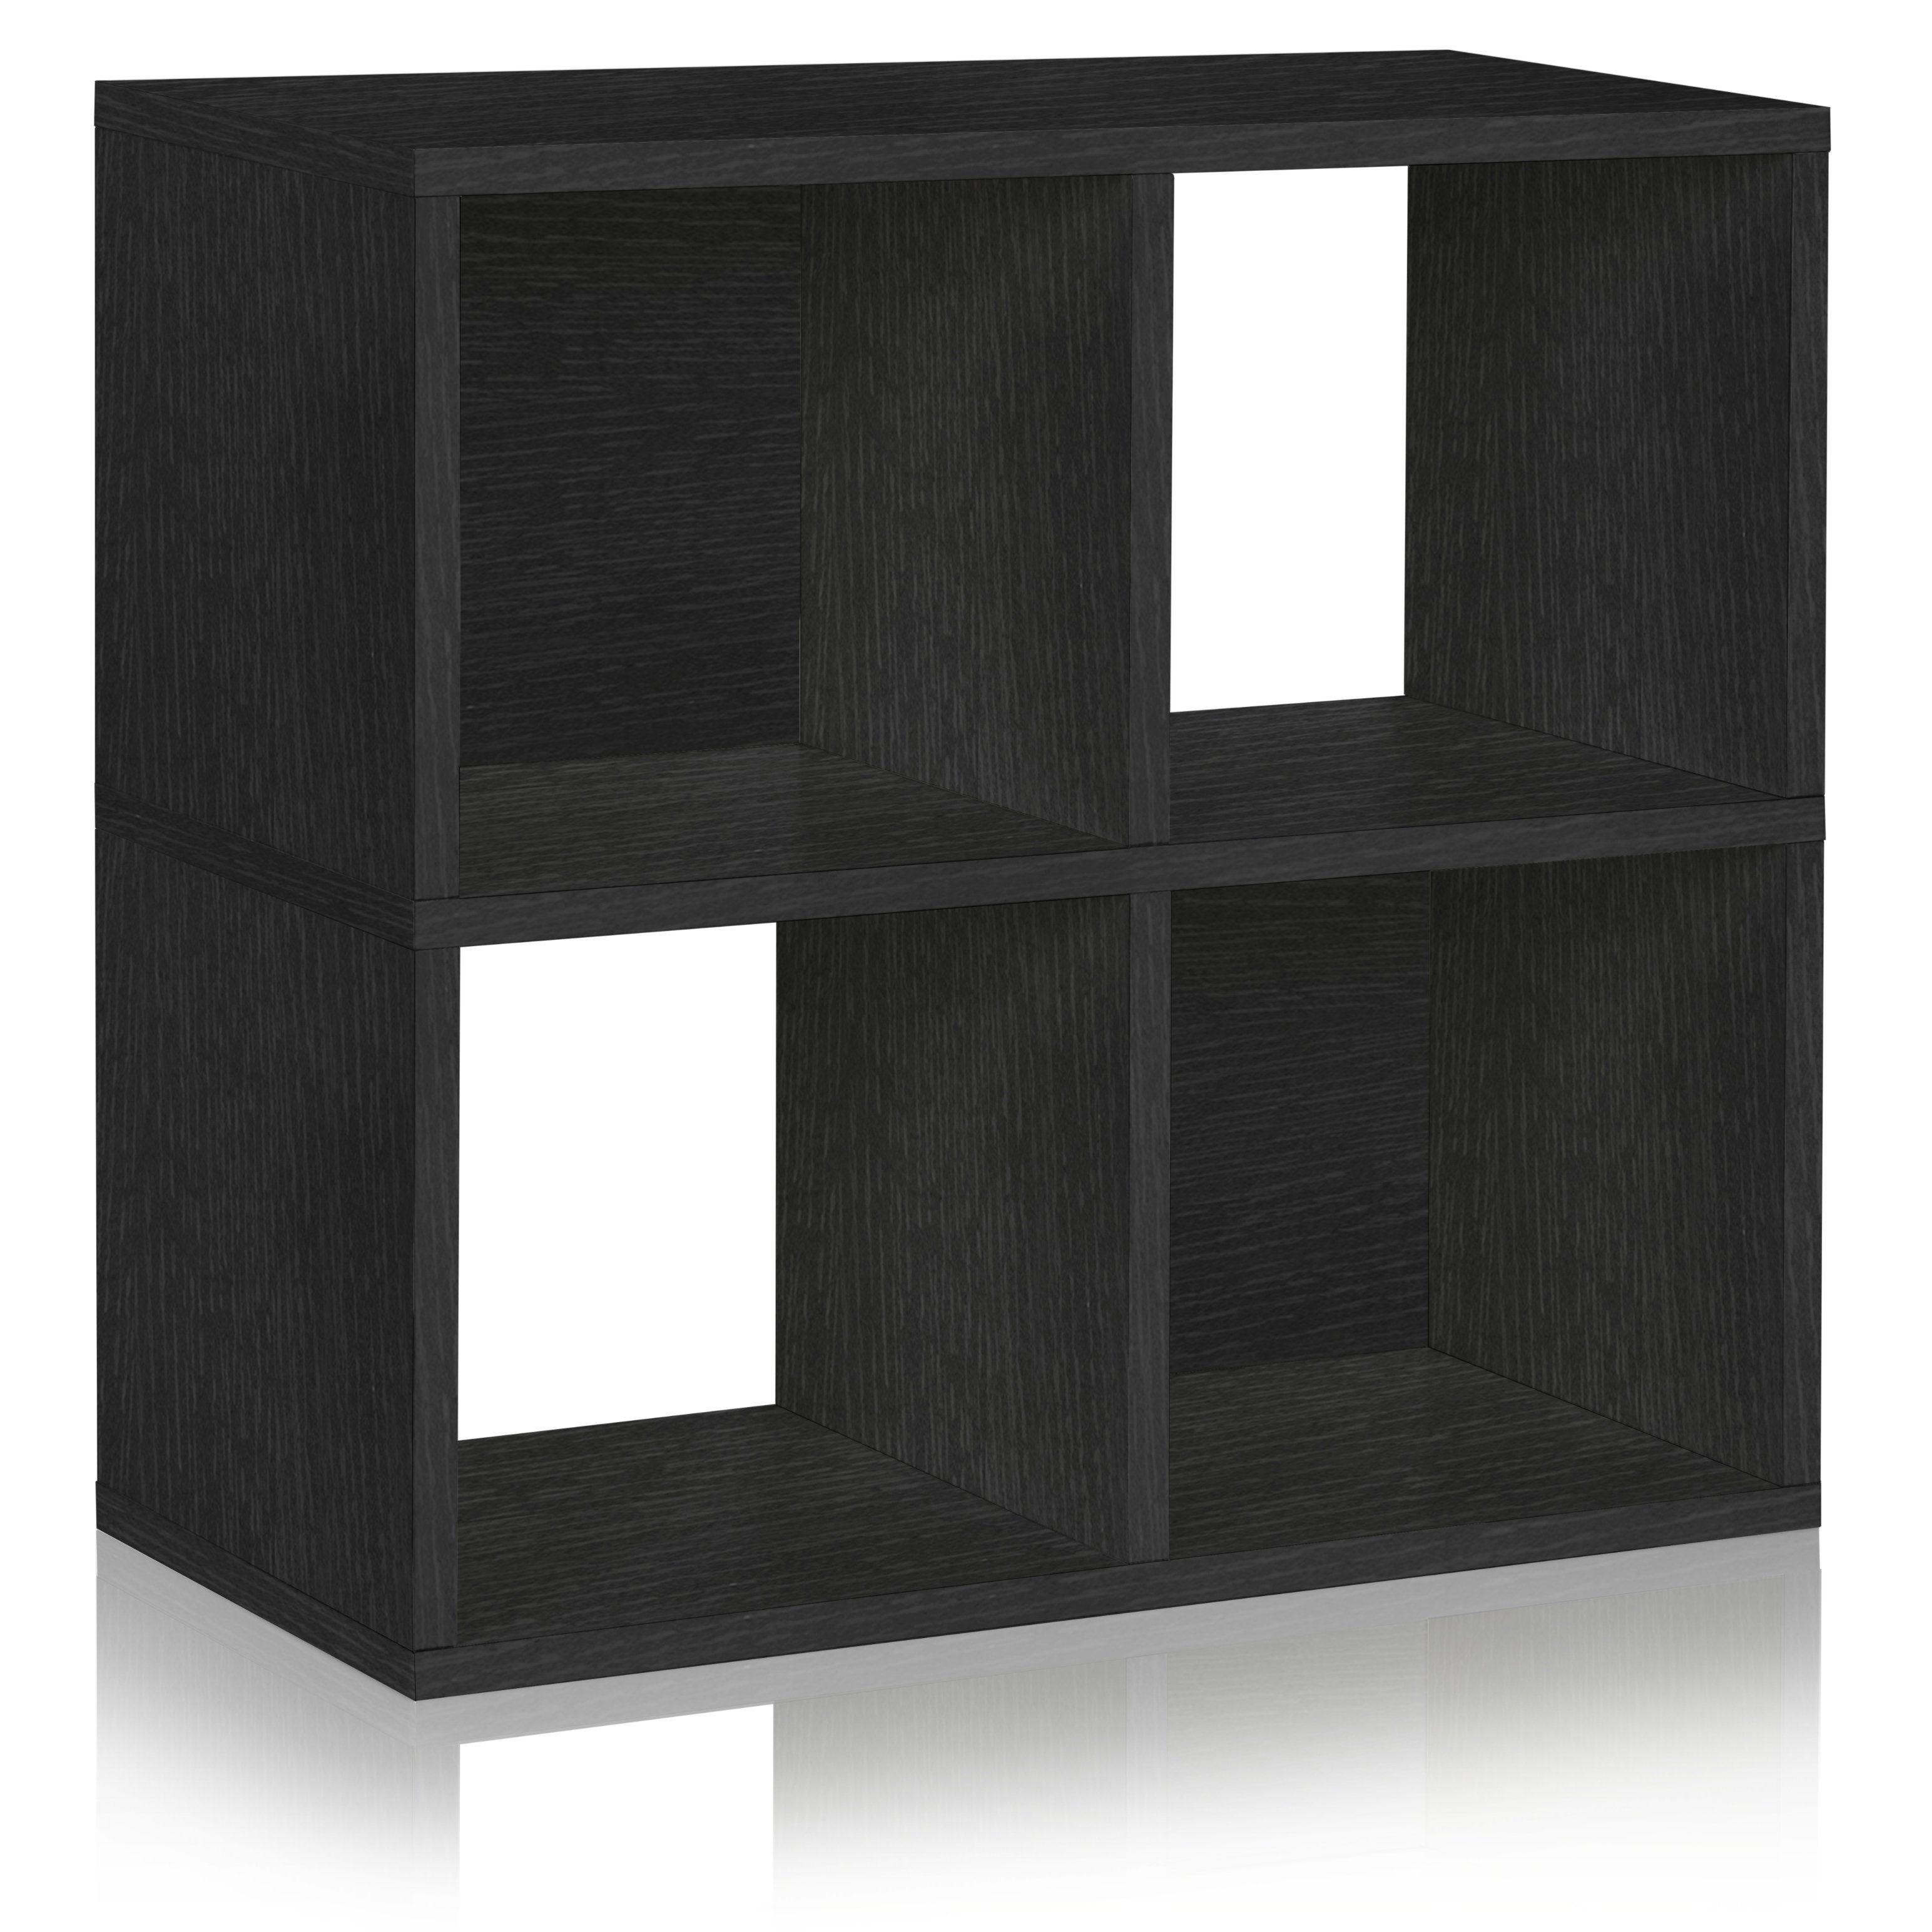 Quad Cubby Shelf And Under Desk Organizer Black Cube Bookcase Under Desk Storage Cube Storage